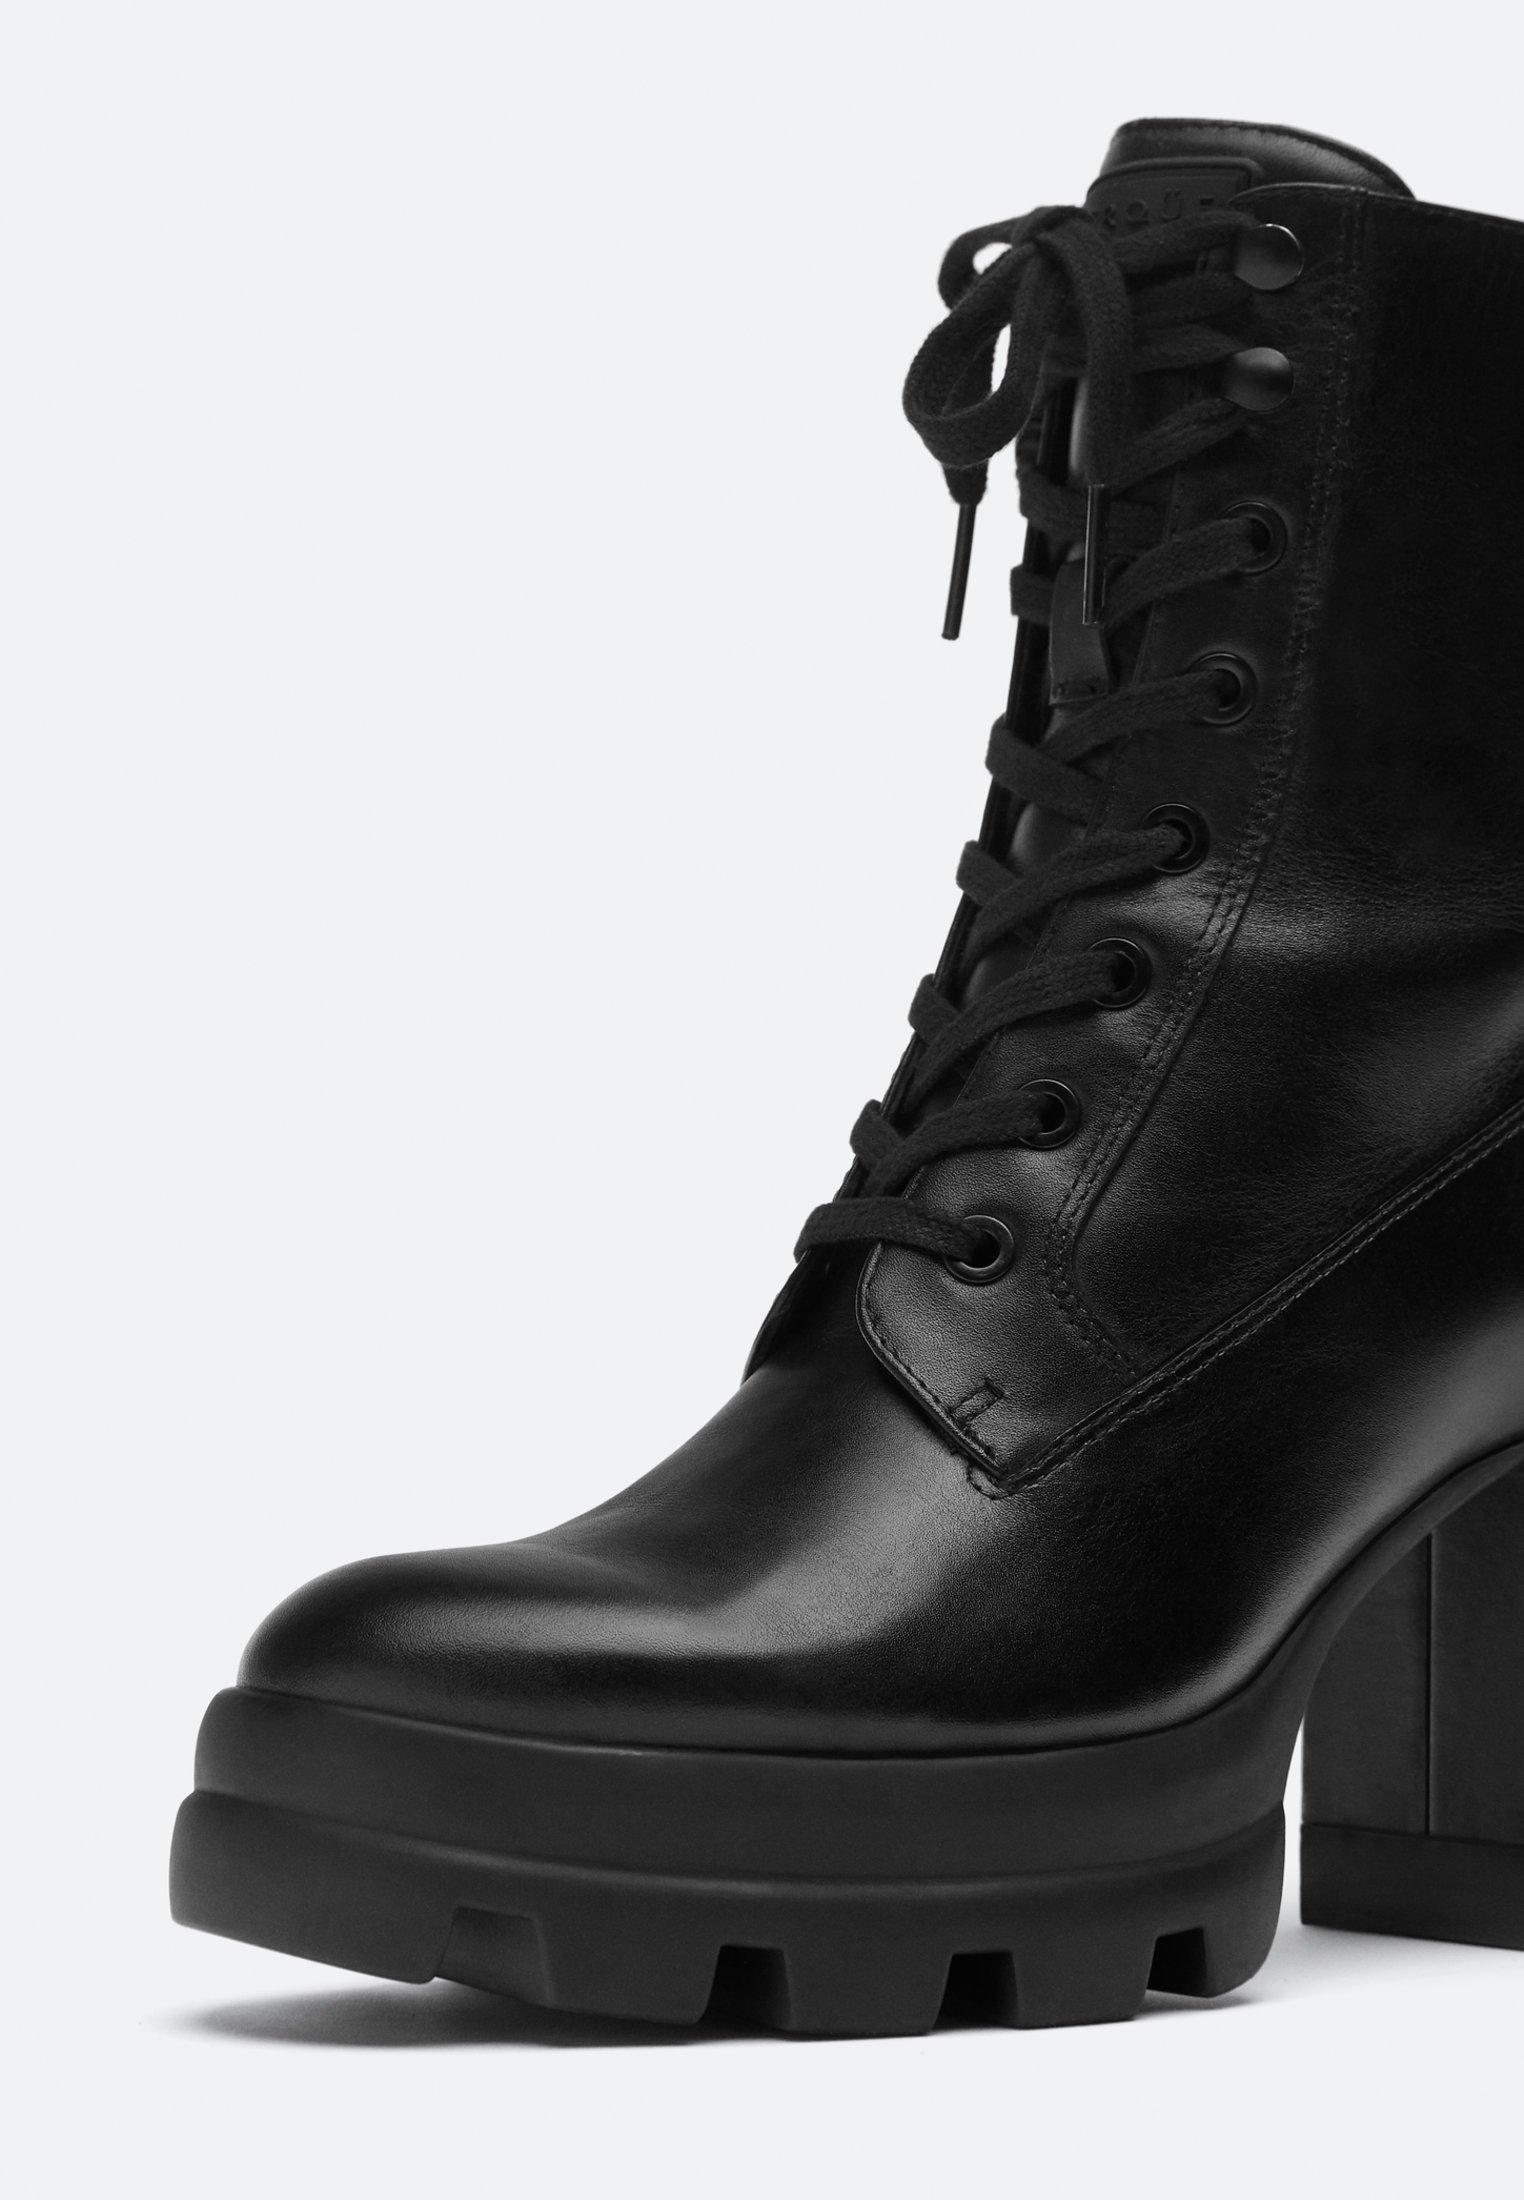 Uterqüe High Heel Stiefelette - Black/schwarz